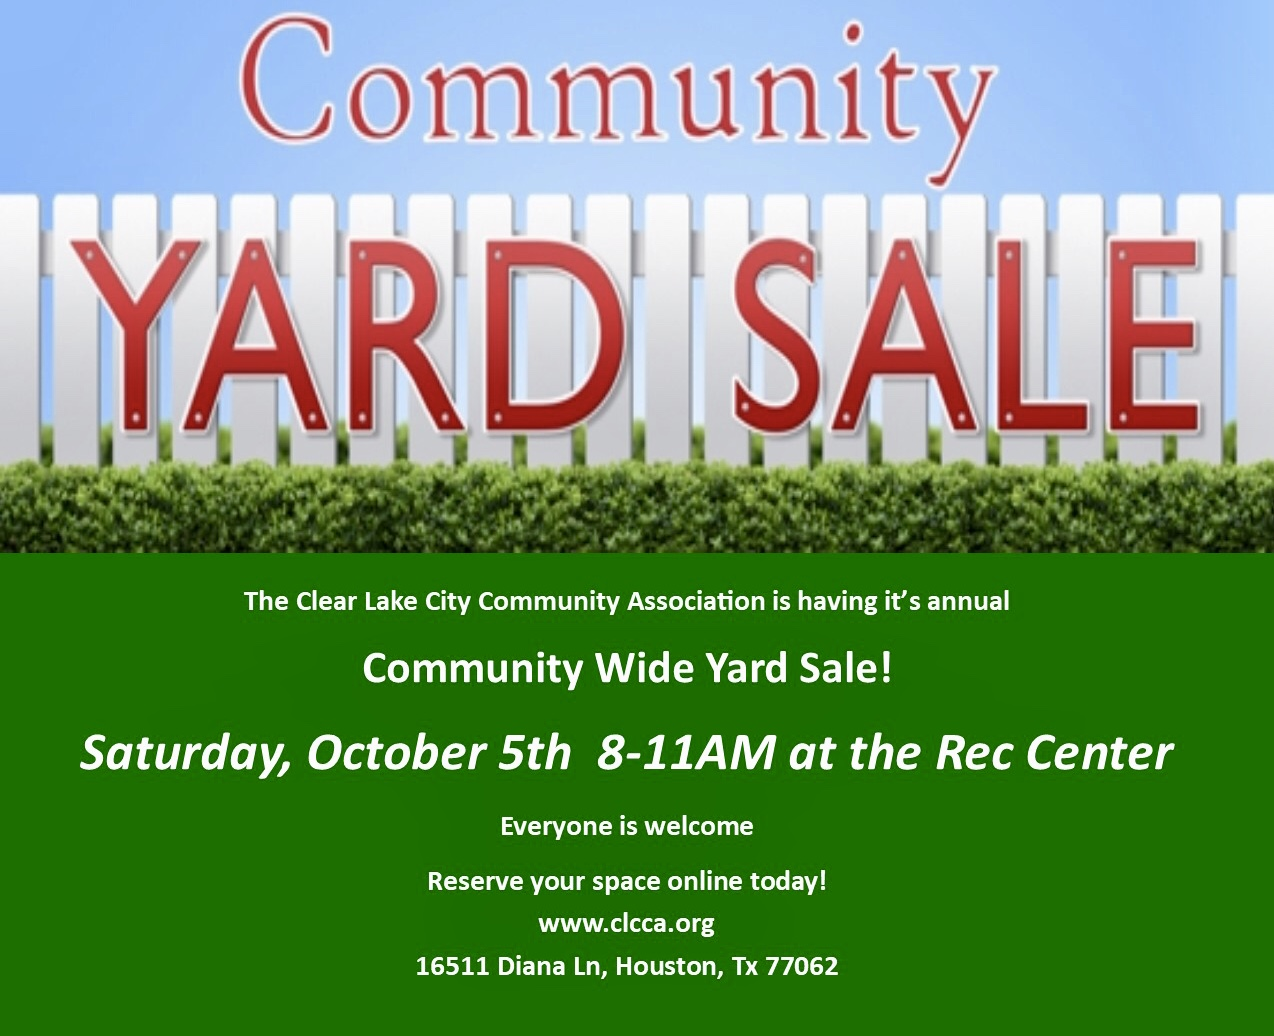 Community Wide Garage Sale Clear Lake City Community Association